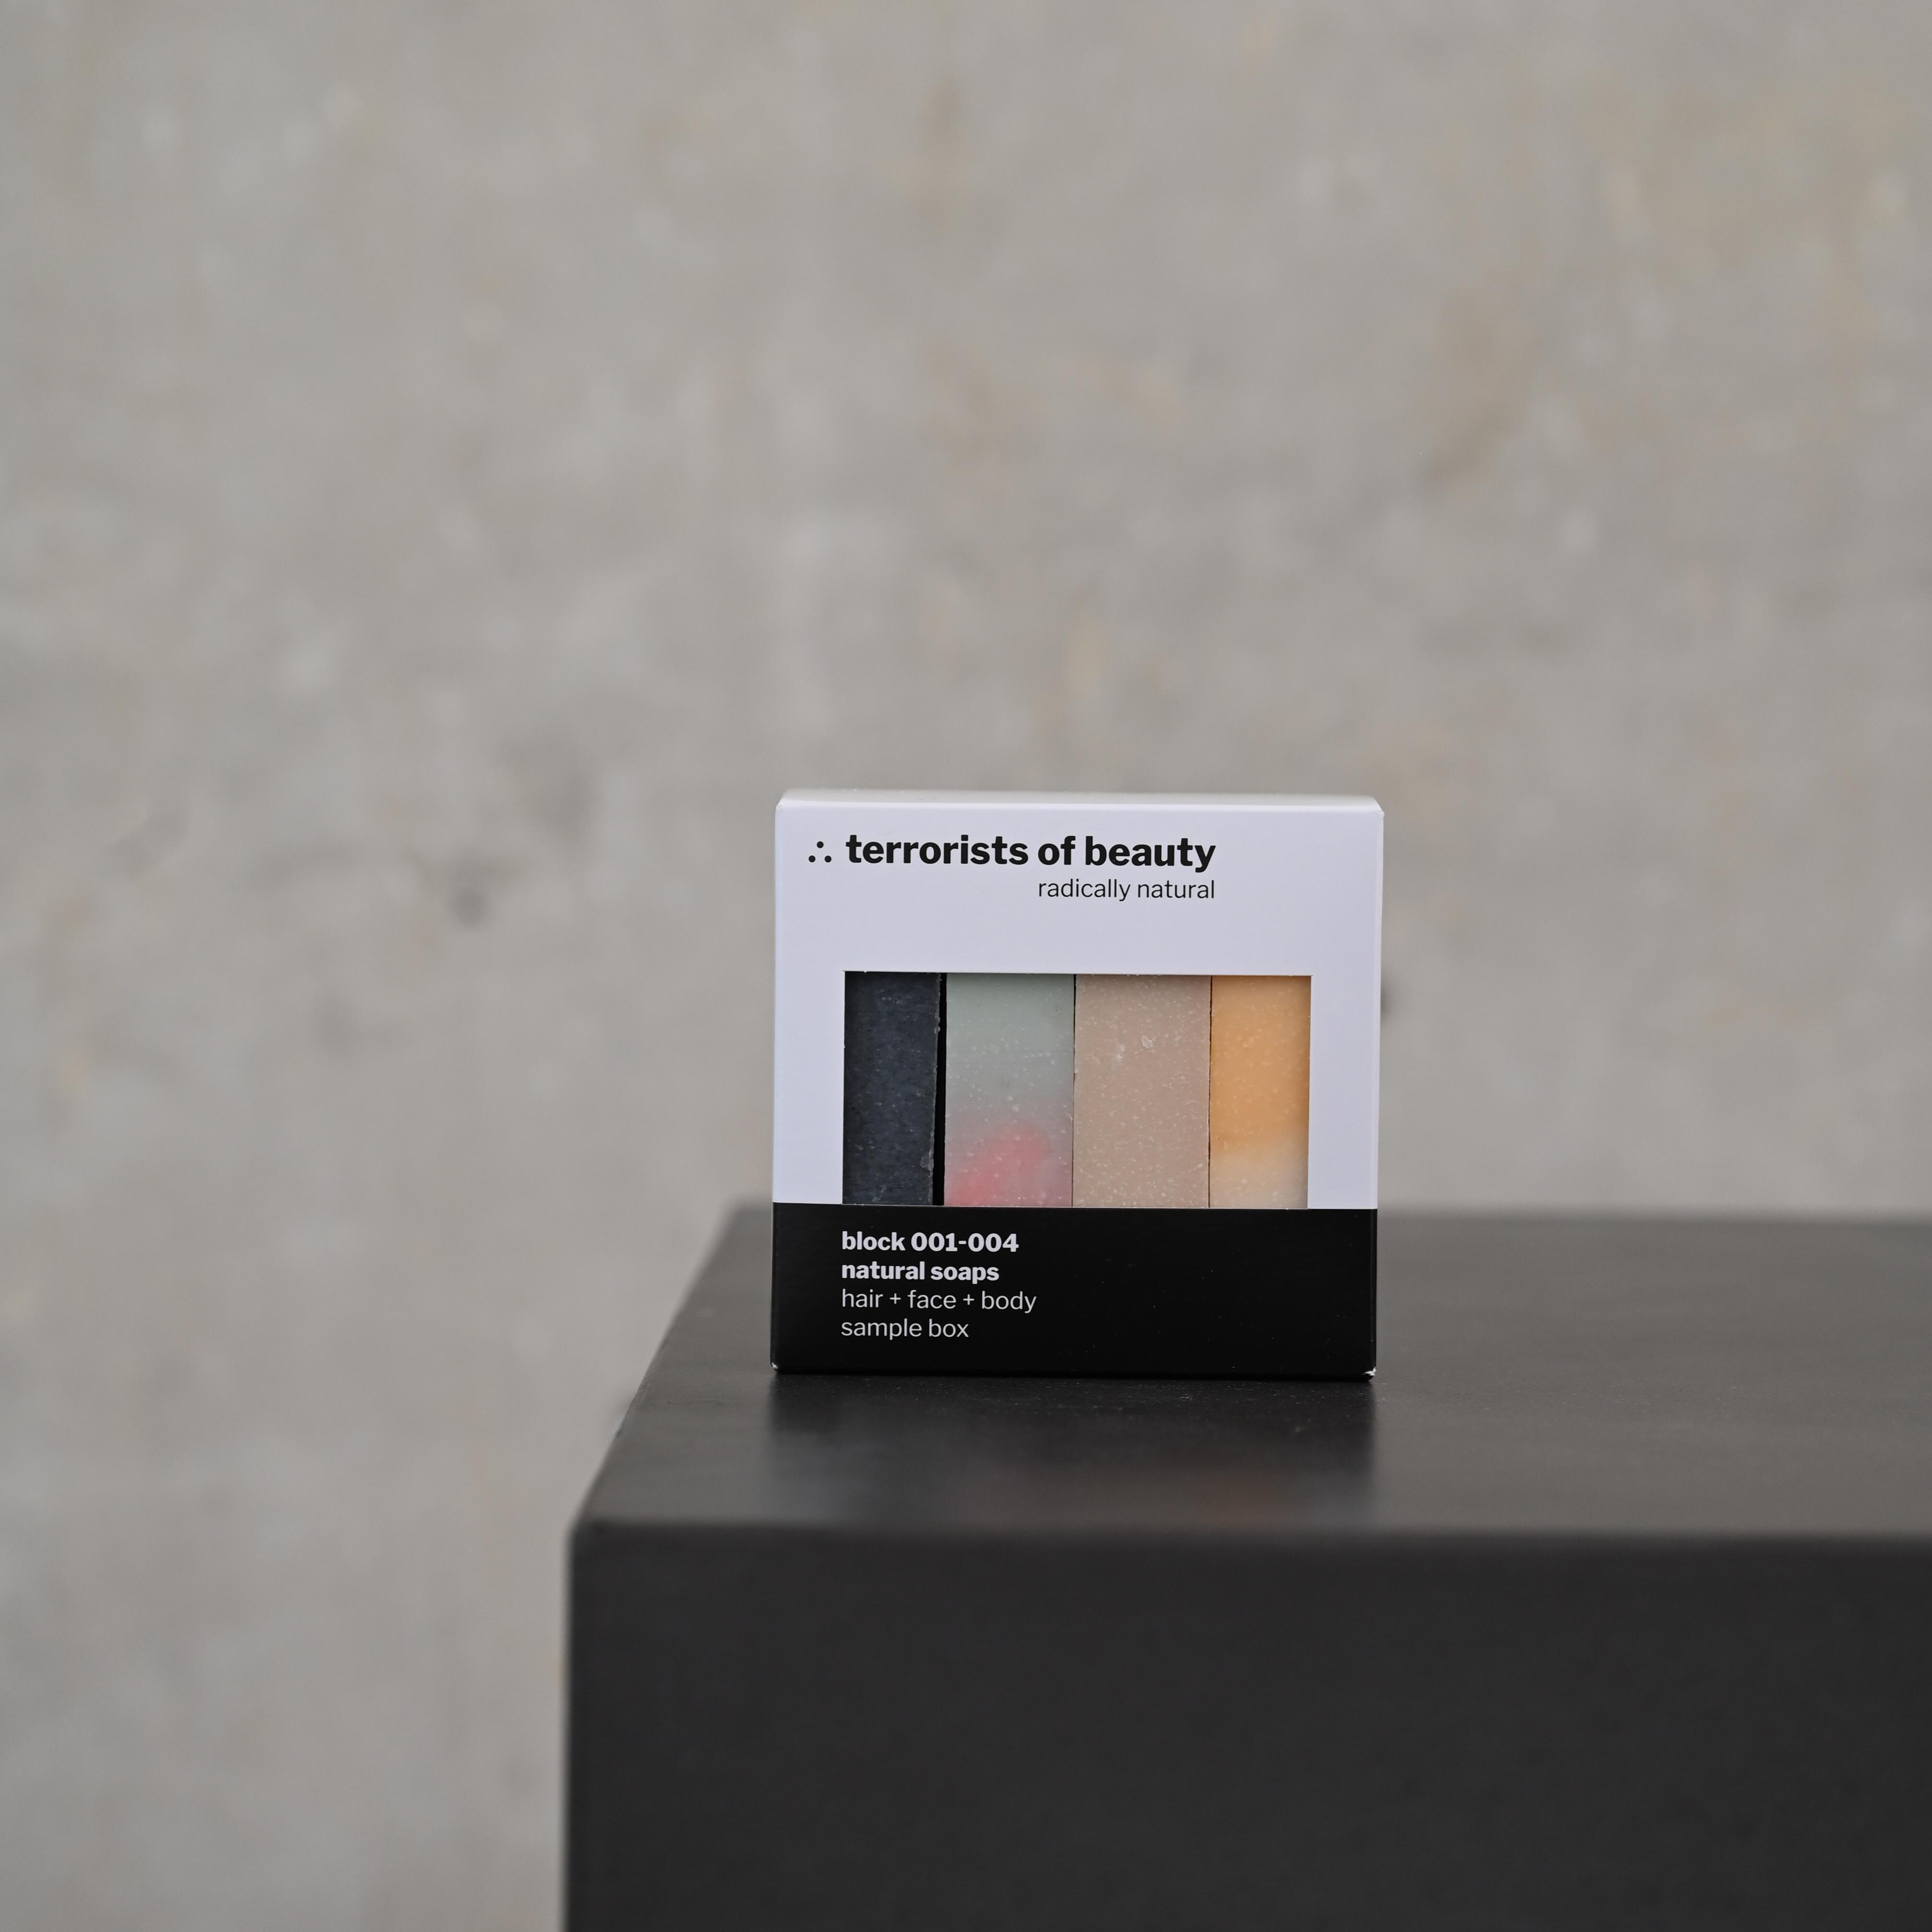 Gift Sample Box von terrorists of beauty